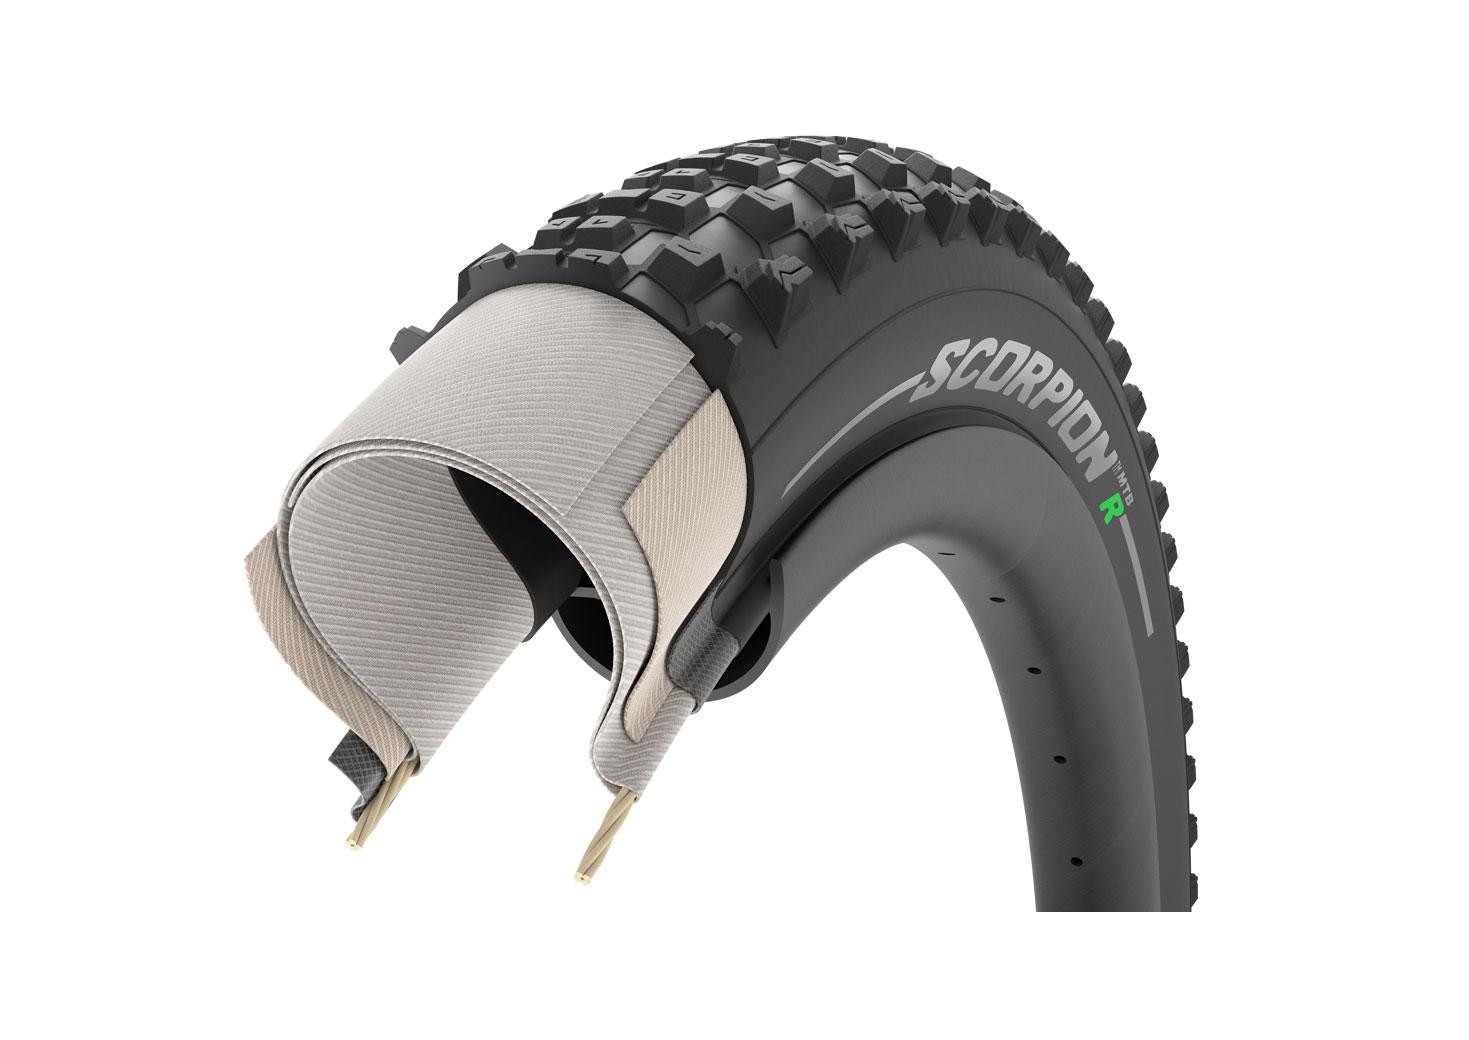 Scorpion™ MTB R layer